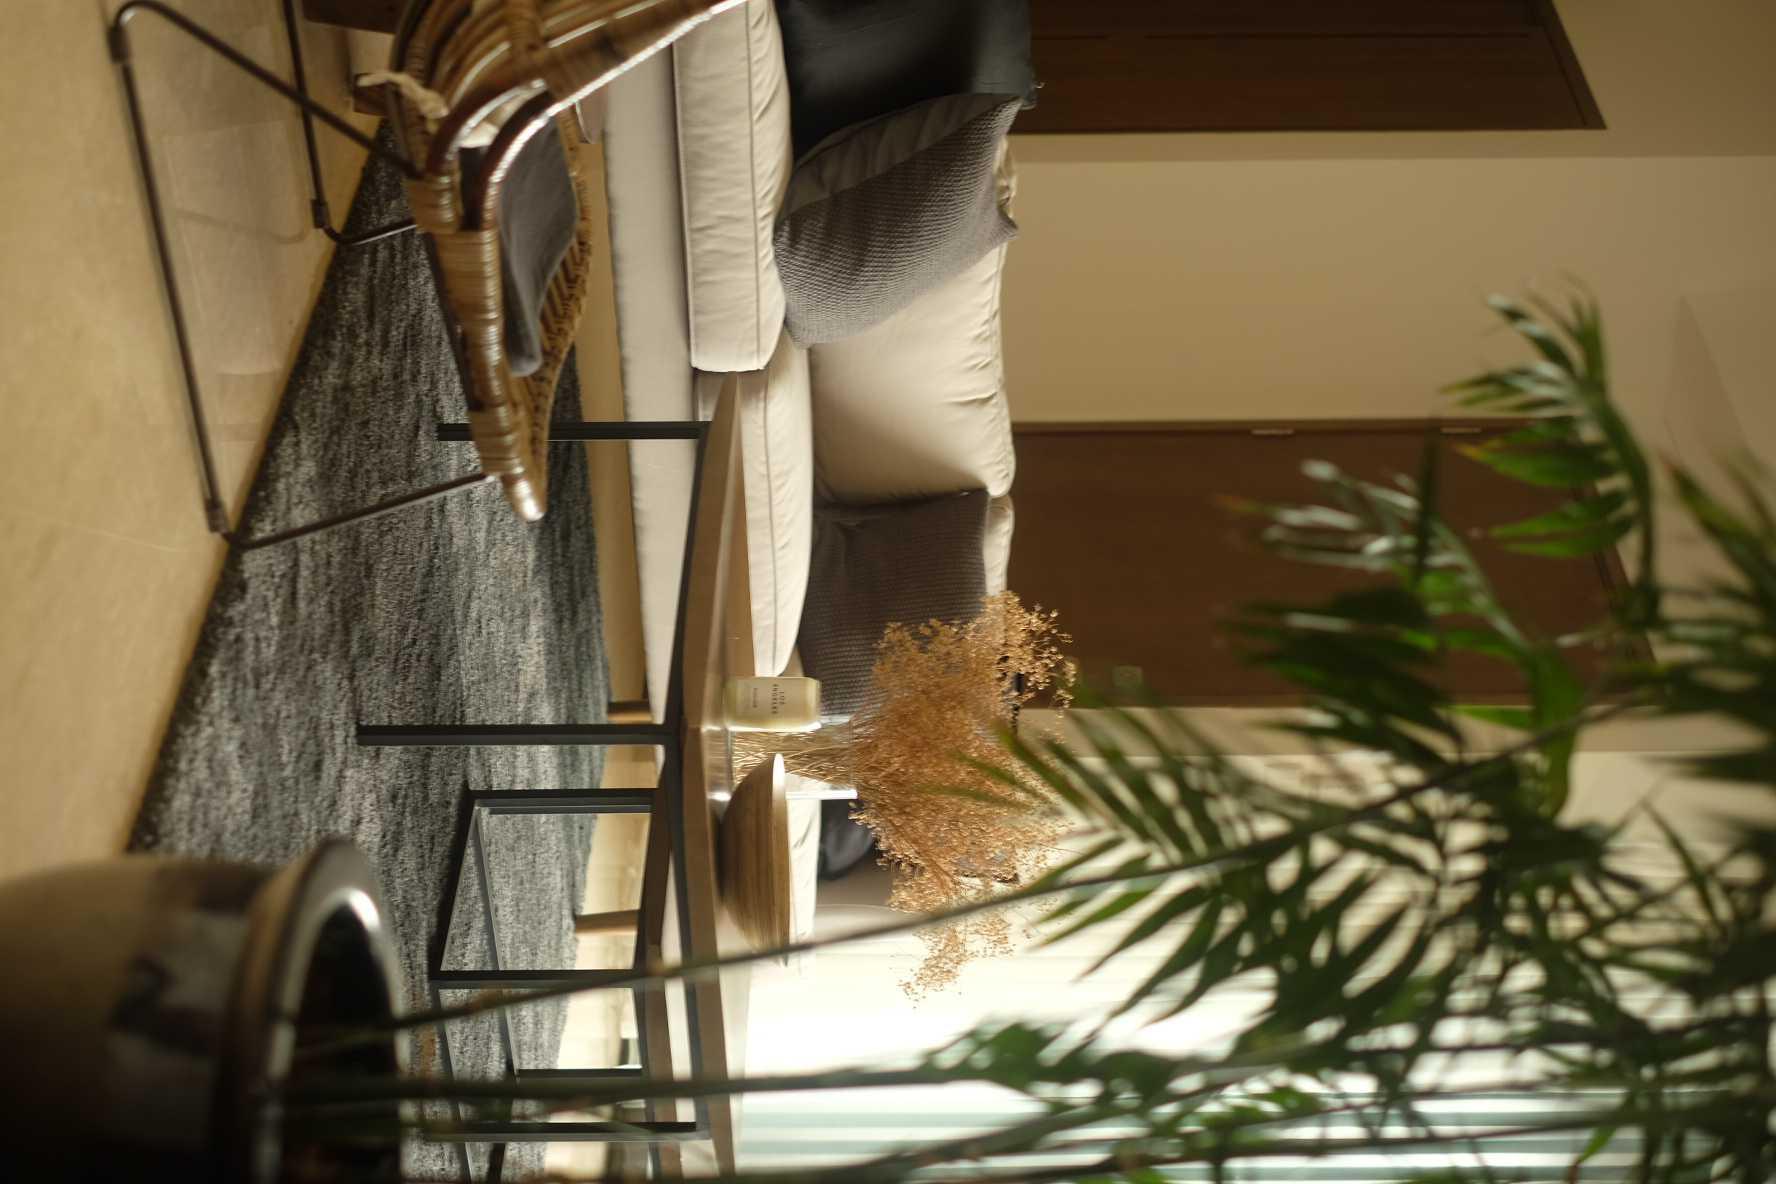 Arkara - Interior Contractor One Park Residence Kby. Lama Utara, Kby. Lama, Kota Jakarta Selatan, Daerah Khusus Ibukota Jakarta, Indonesia Kby. Lama Utara, Kby. Lama, Kota Jakarta Selatan, Daerah Khusus Ibukota Jakarta, Indonesia Arcon-Interior-Furniture-Contractor-One-Park-Residence  69860